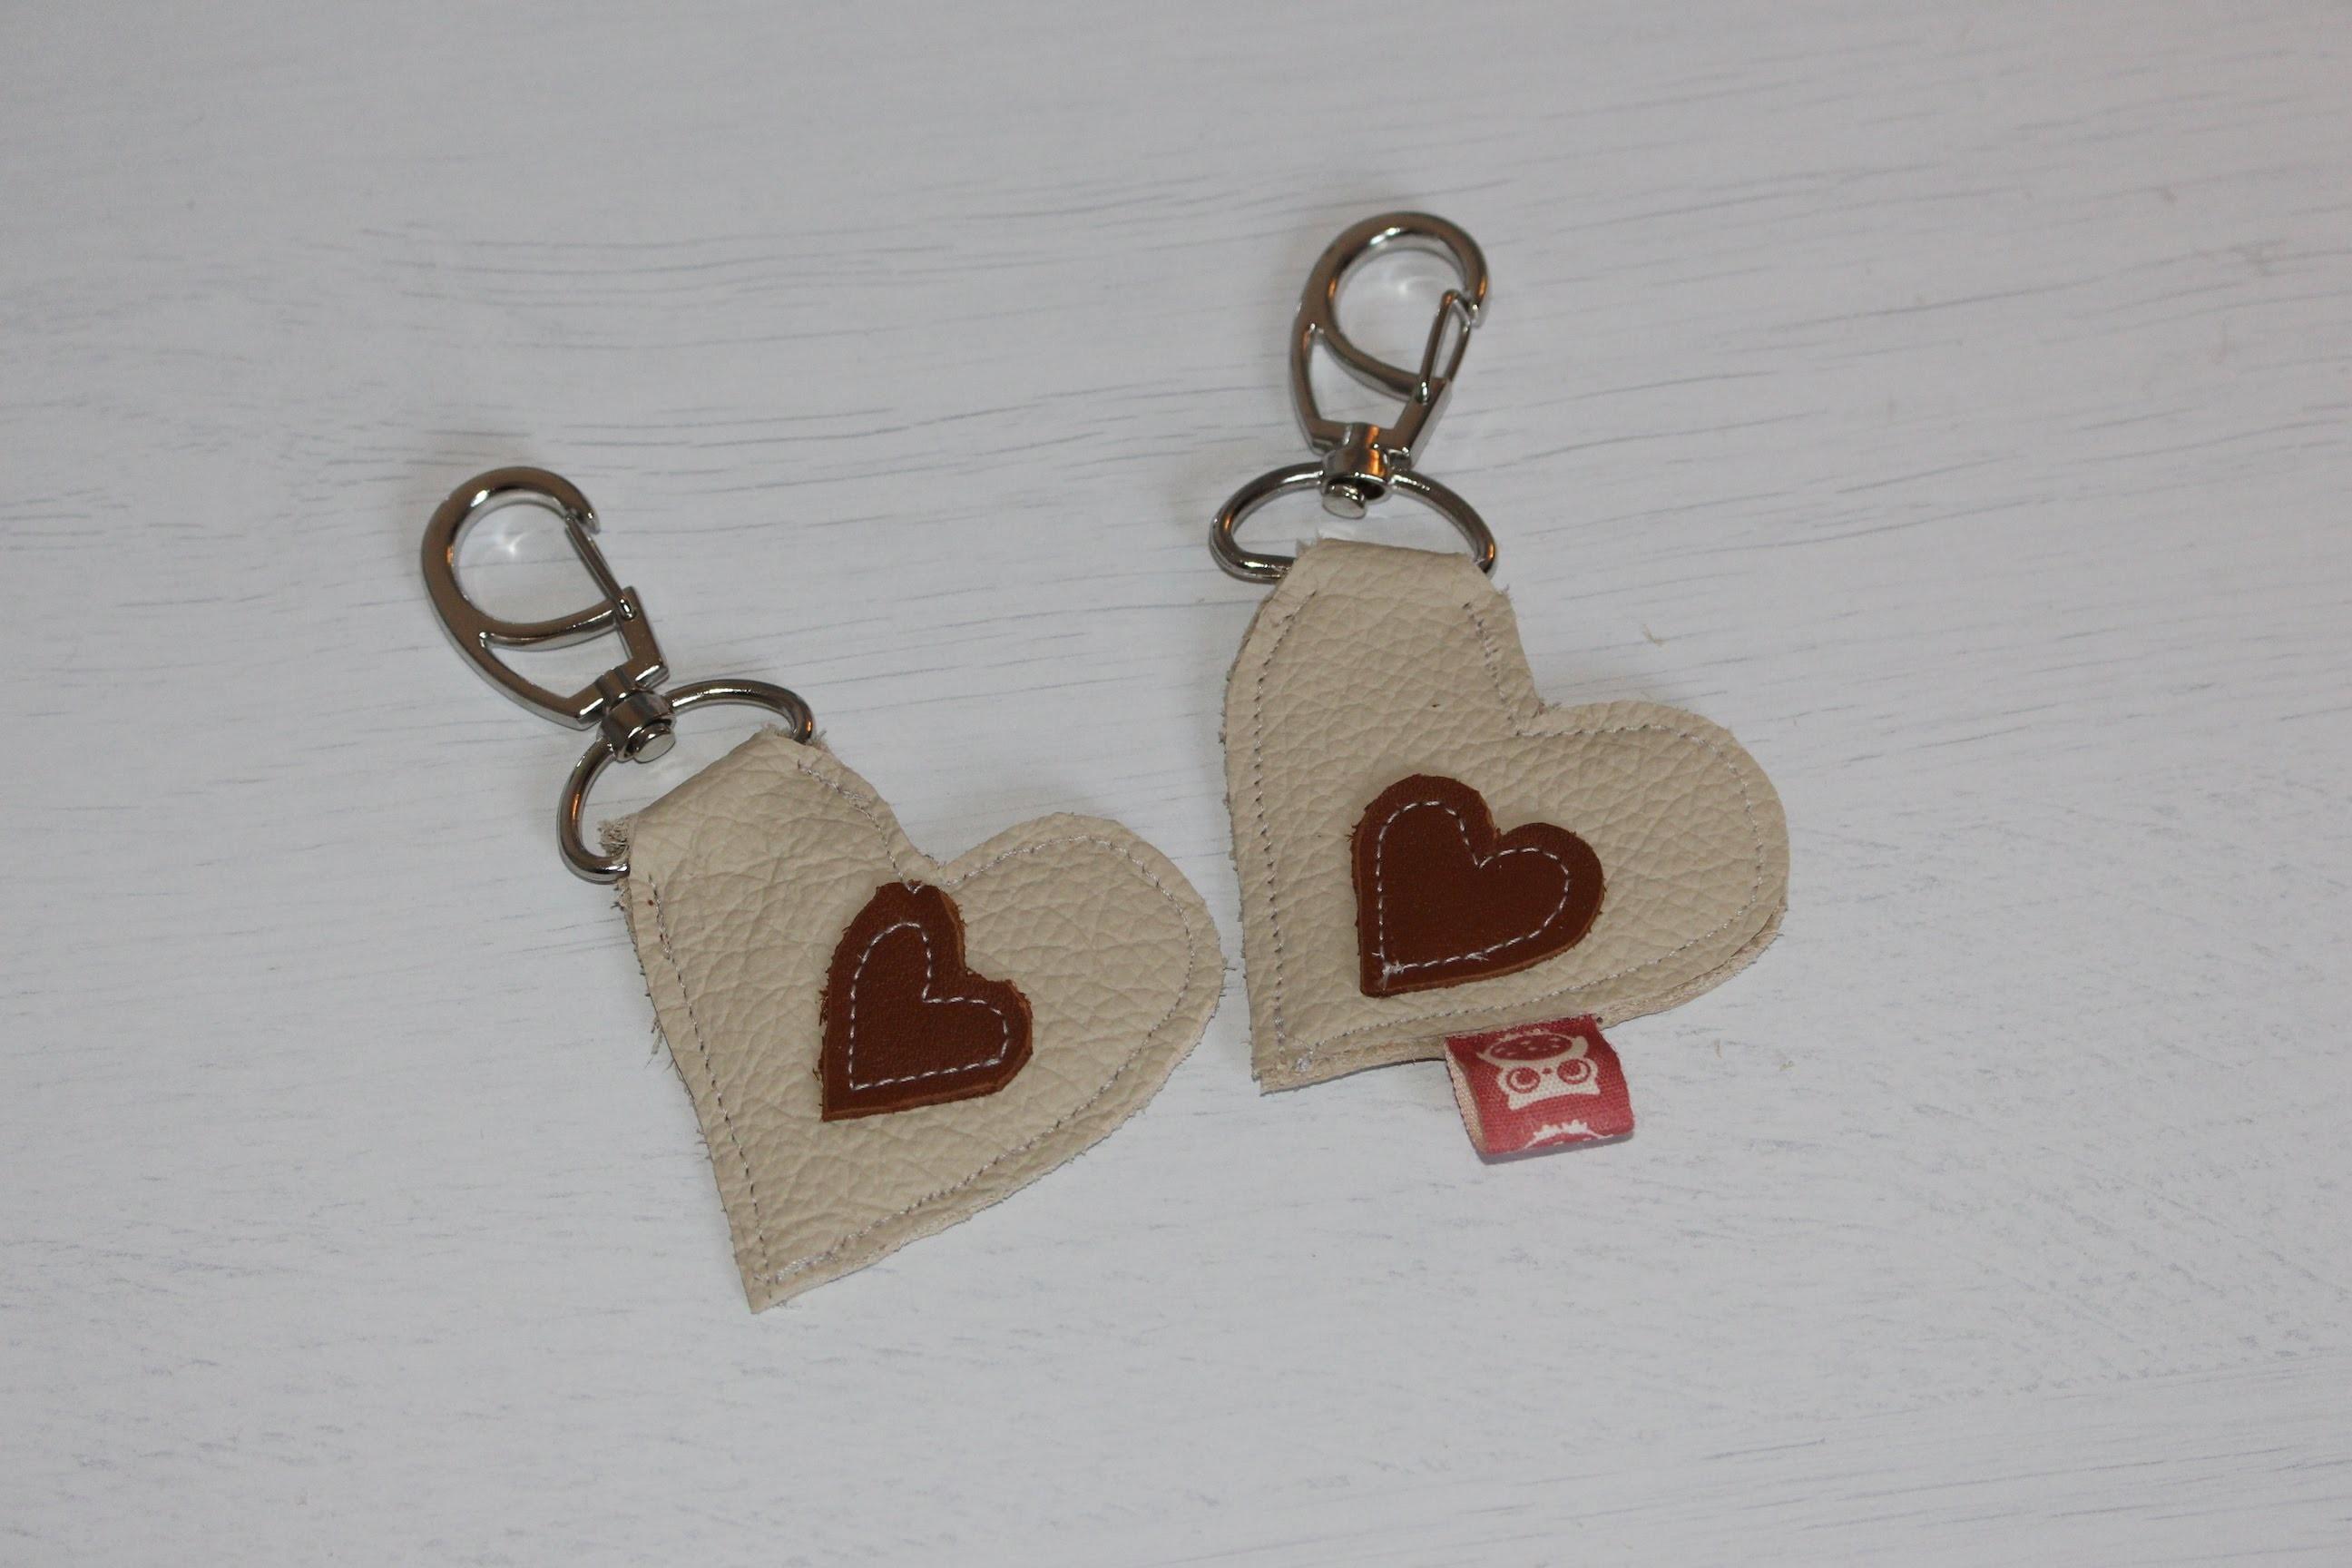 DIY Schlüsselanhänger selber nähen *Valentinstagsgeschenk*